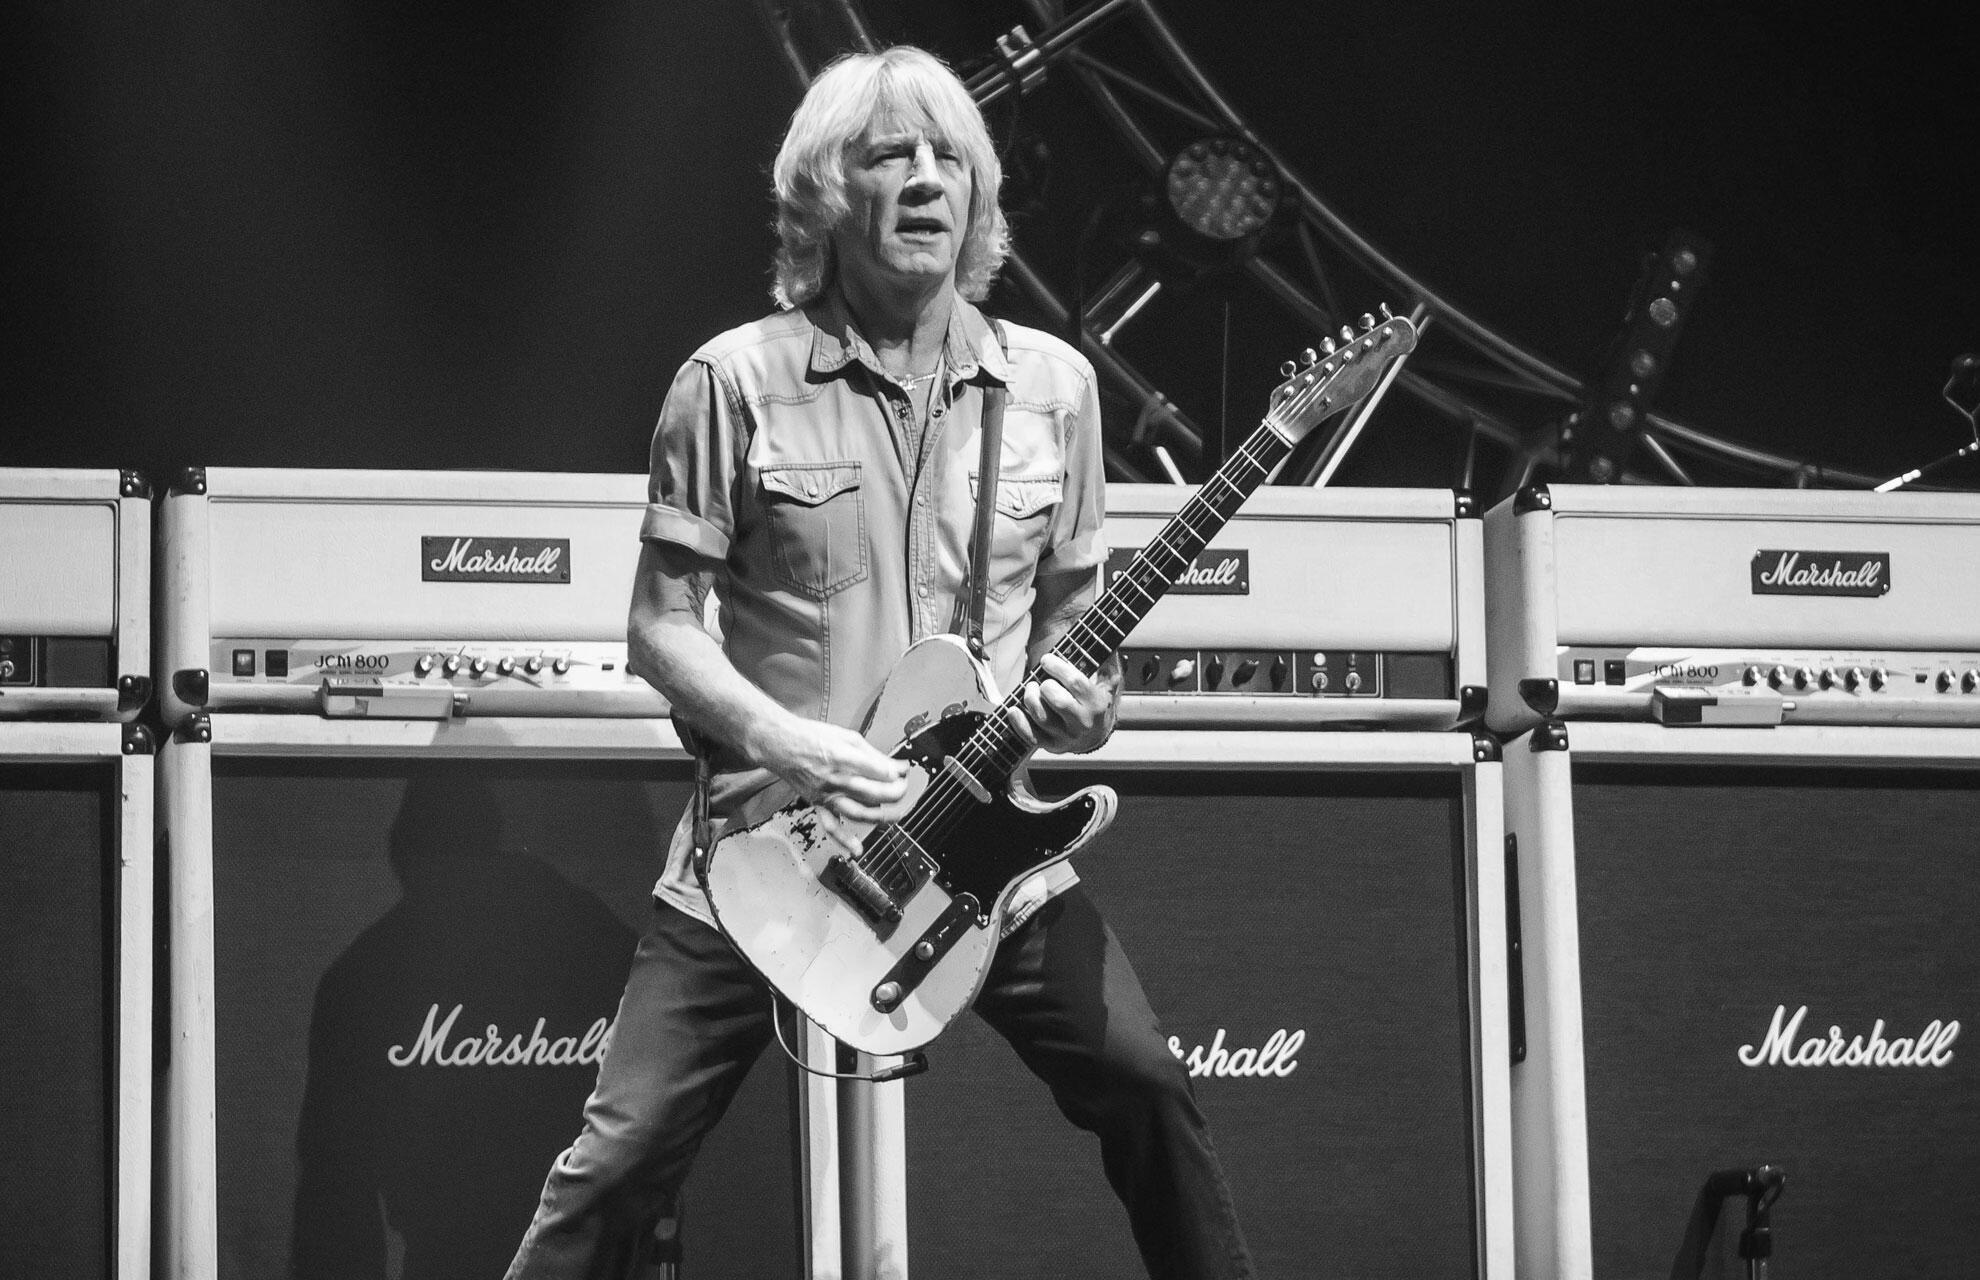 Bild zu Rick Parfitt, Status Quo, Gitarrist